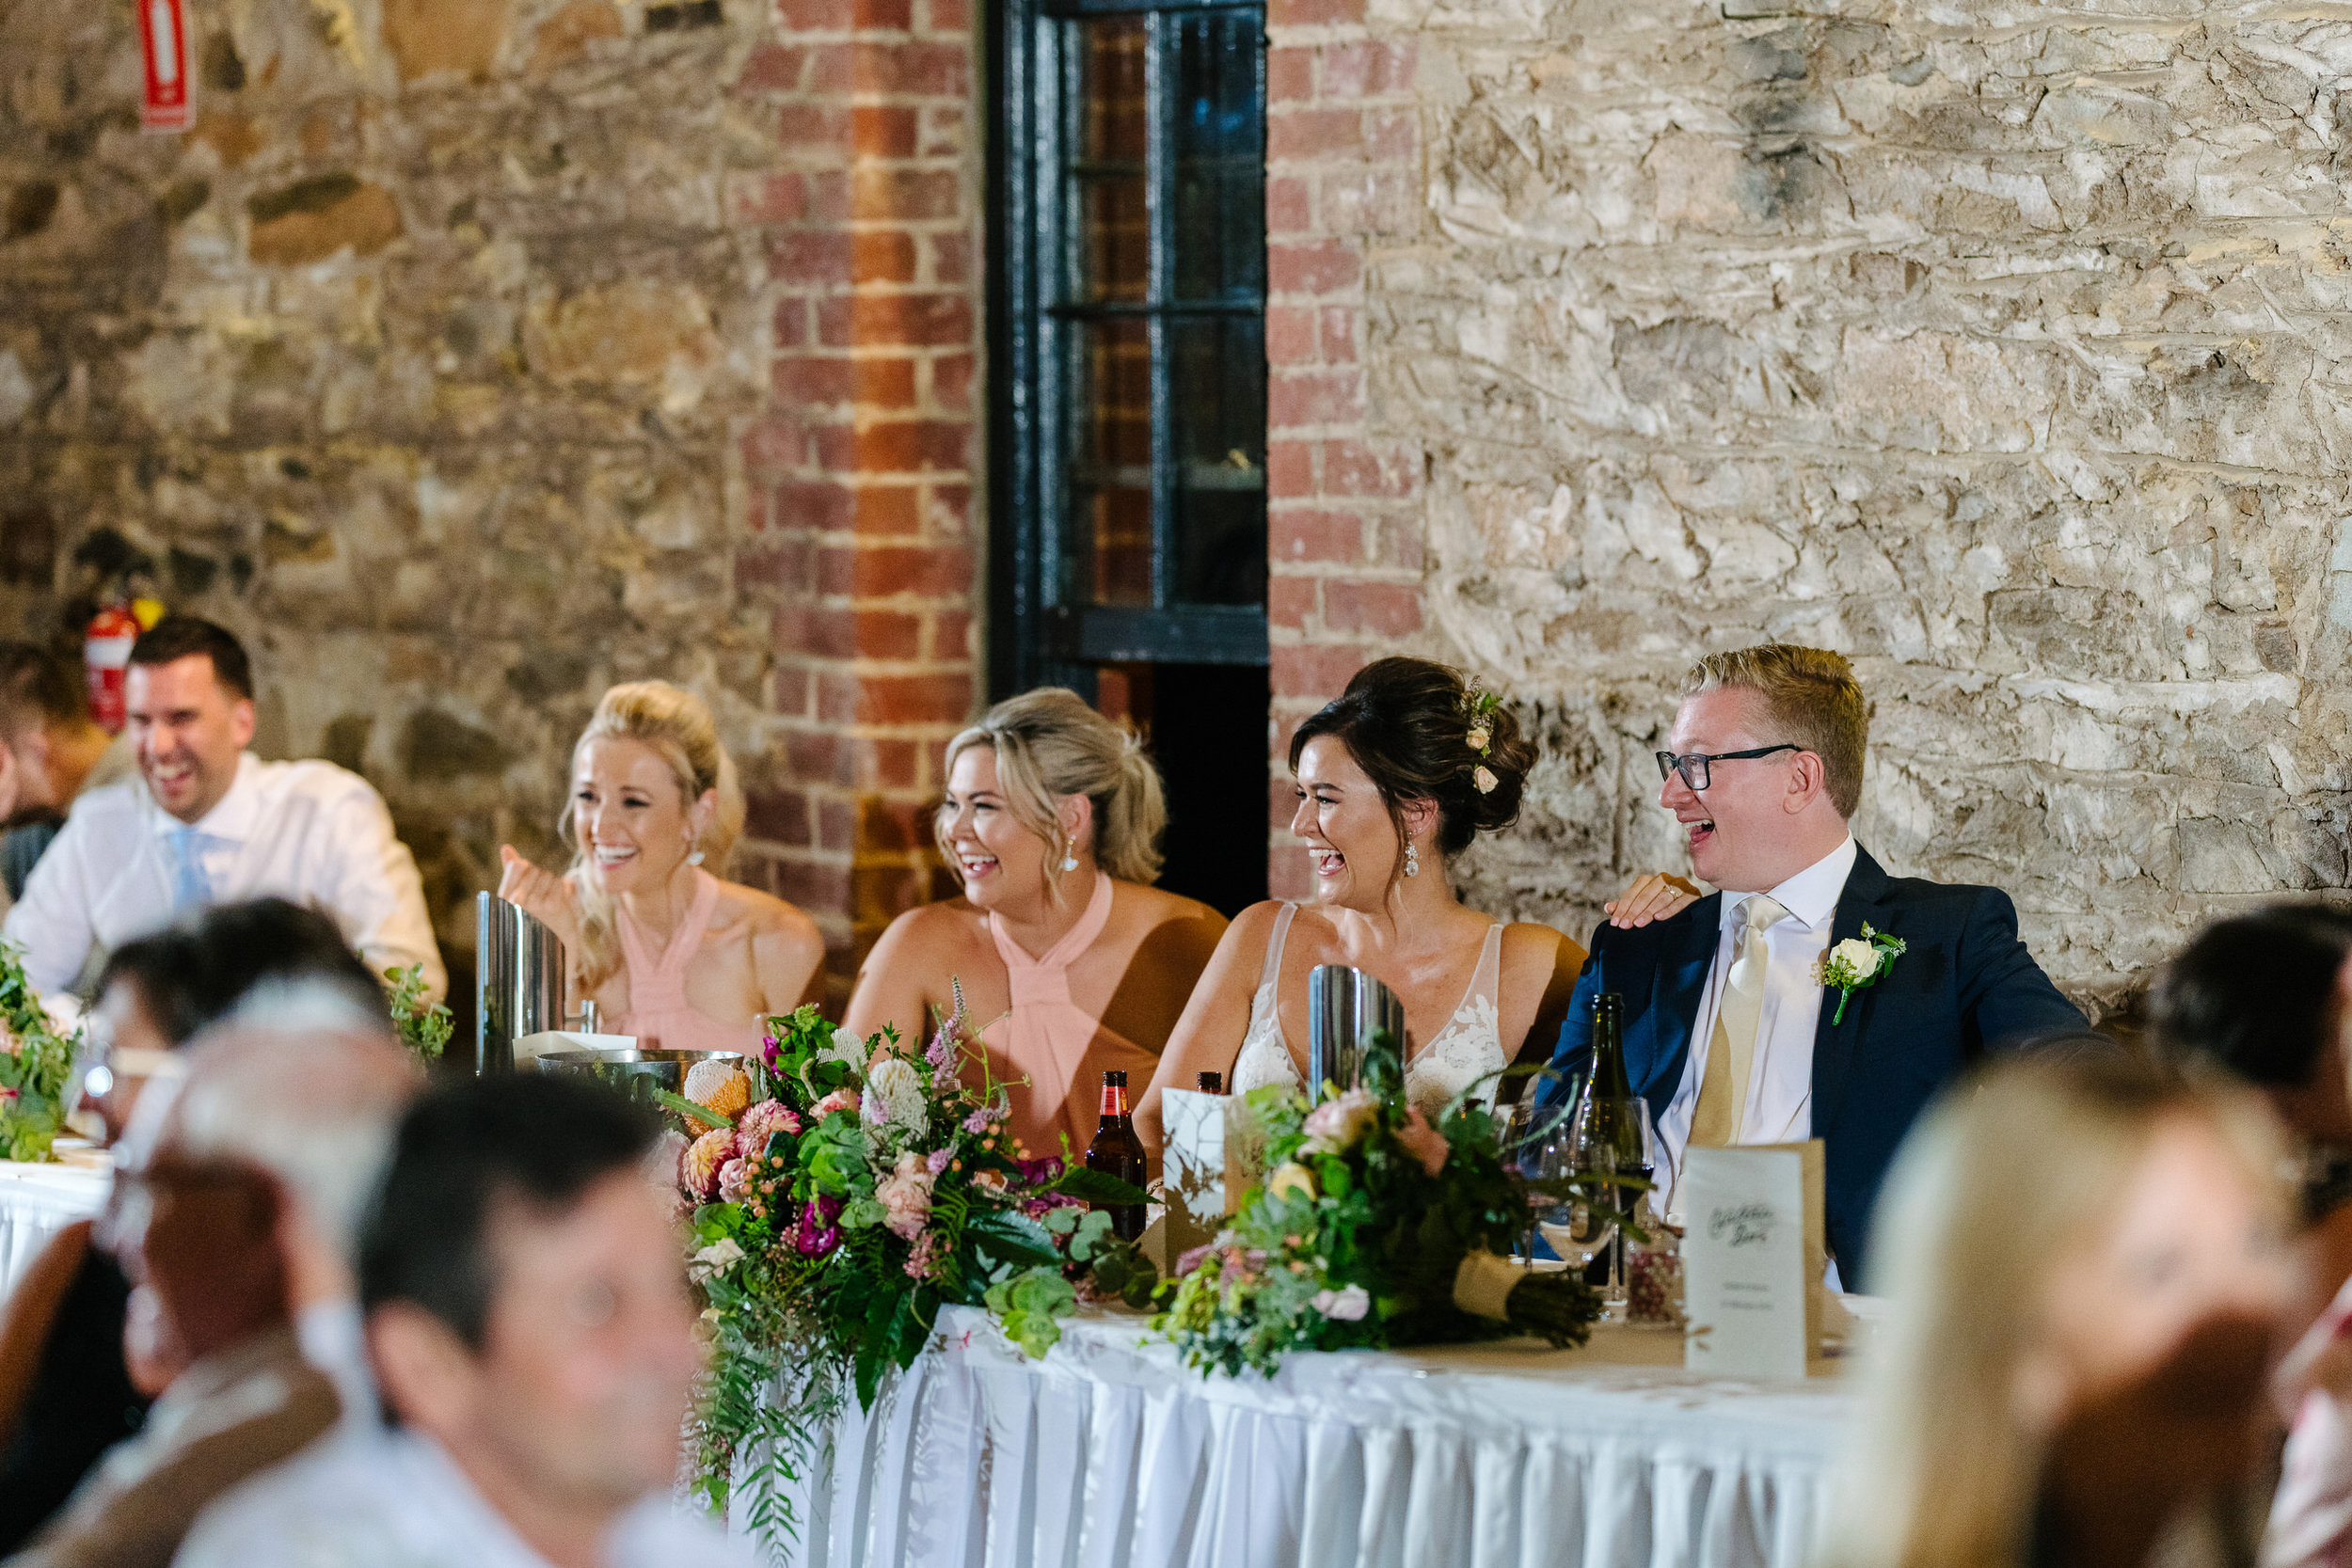 Justin_And_Jim_Photography_Chateau_Dore_Bendigo_Wedding88.JPG